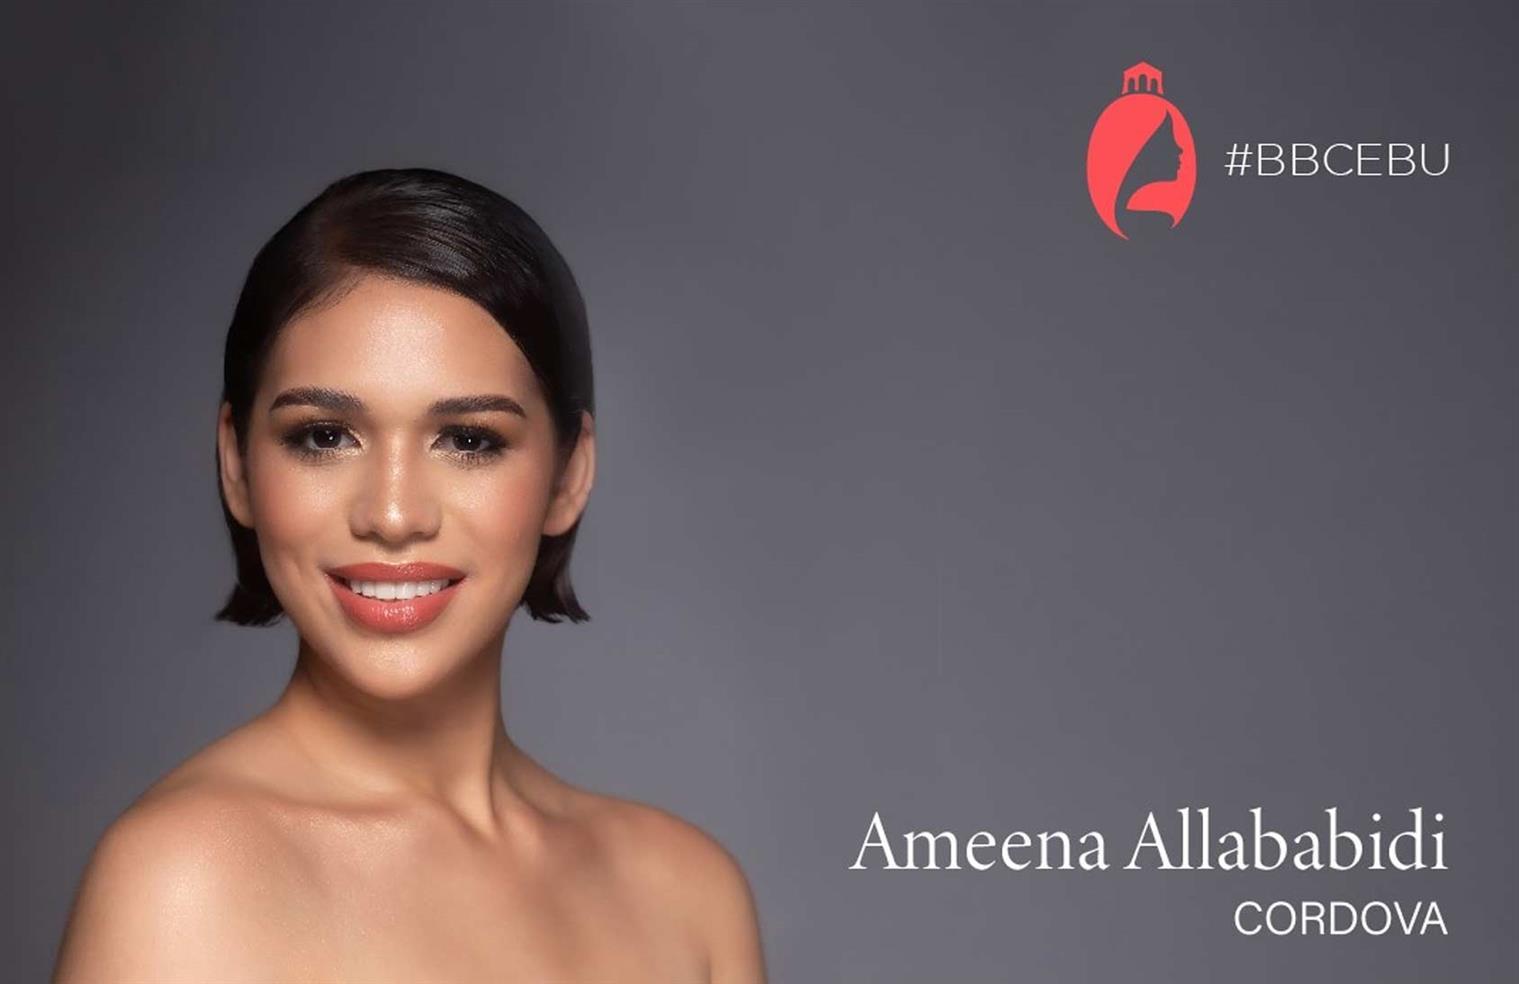 Ameena Allababidi representing Cordova